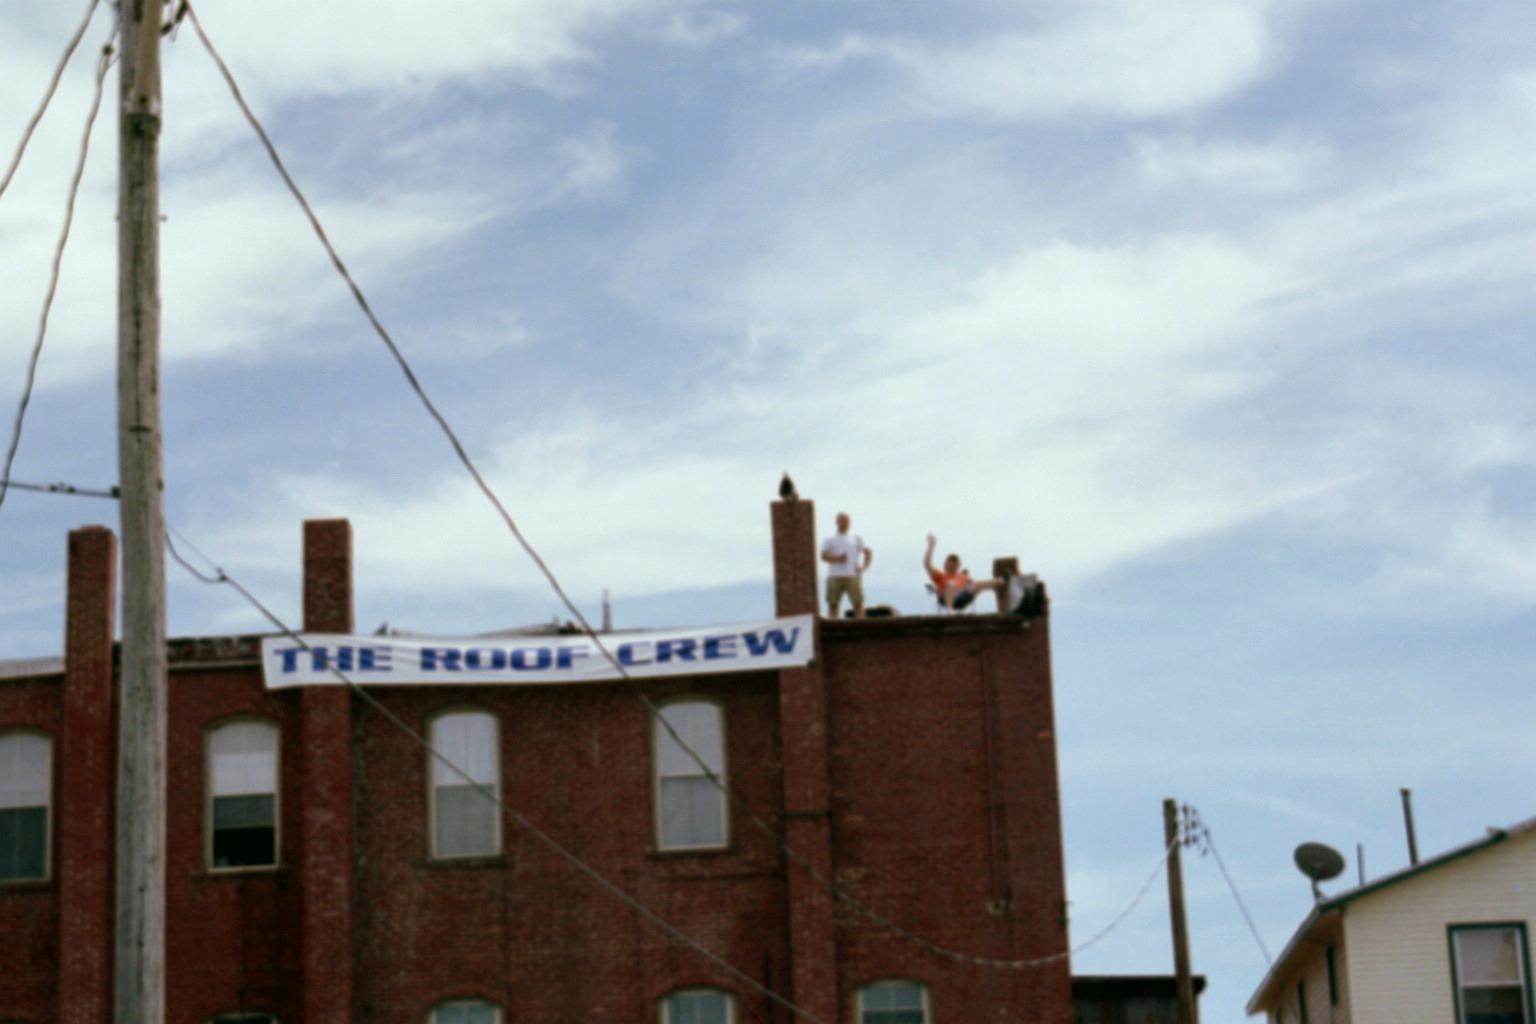 The Roof Crew